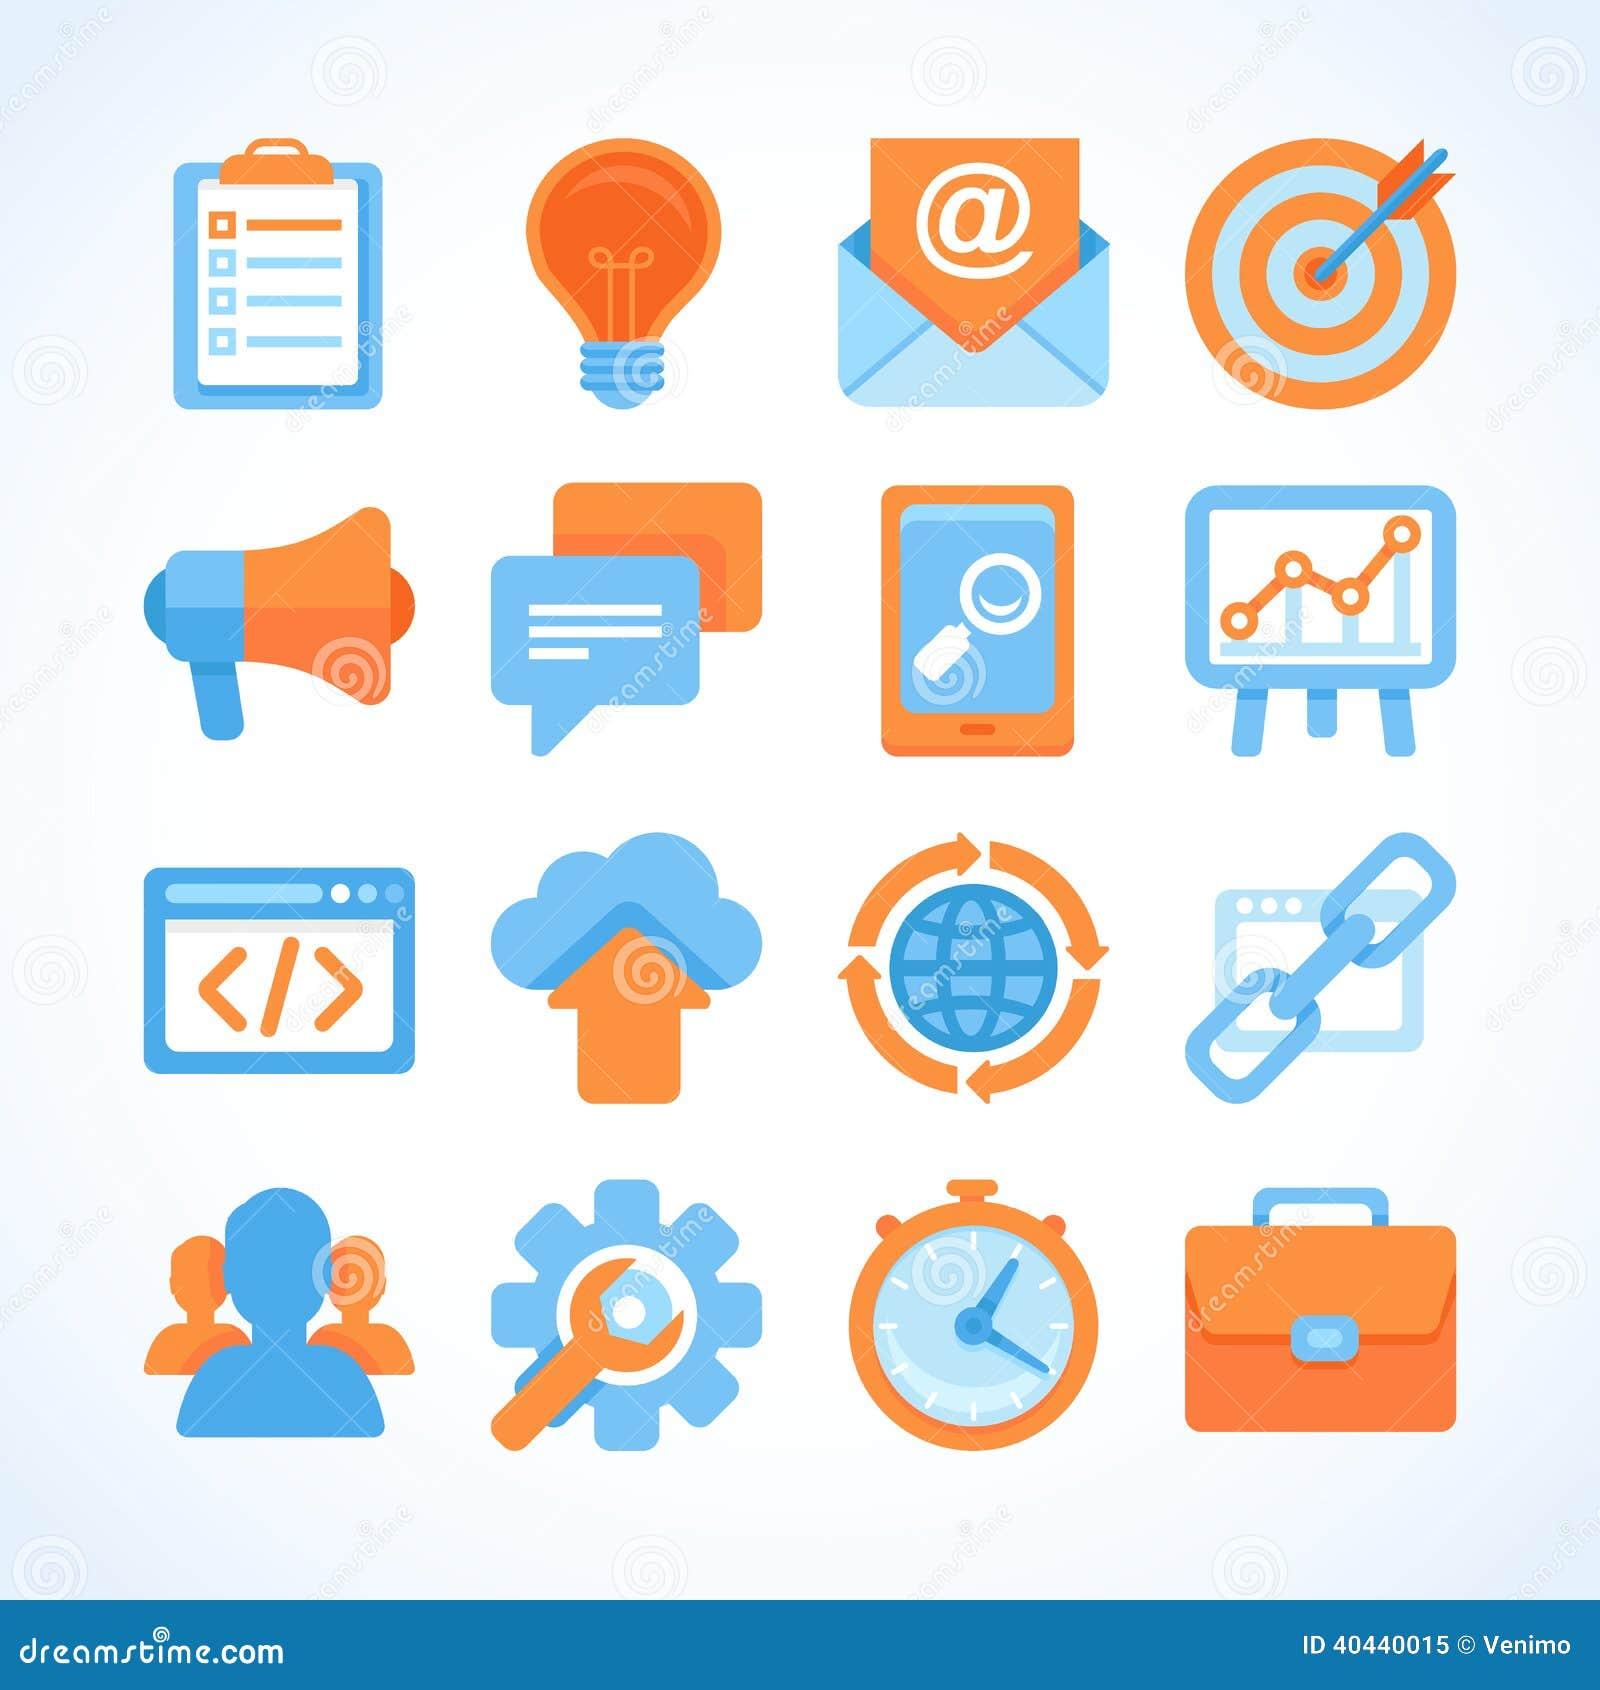 Royalty Free Stock Photo Flat Icon Set Seo Symbols Inter  Marketing Design Elements Online Business Signs Image40440015